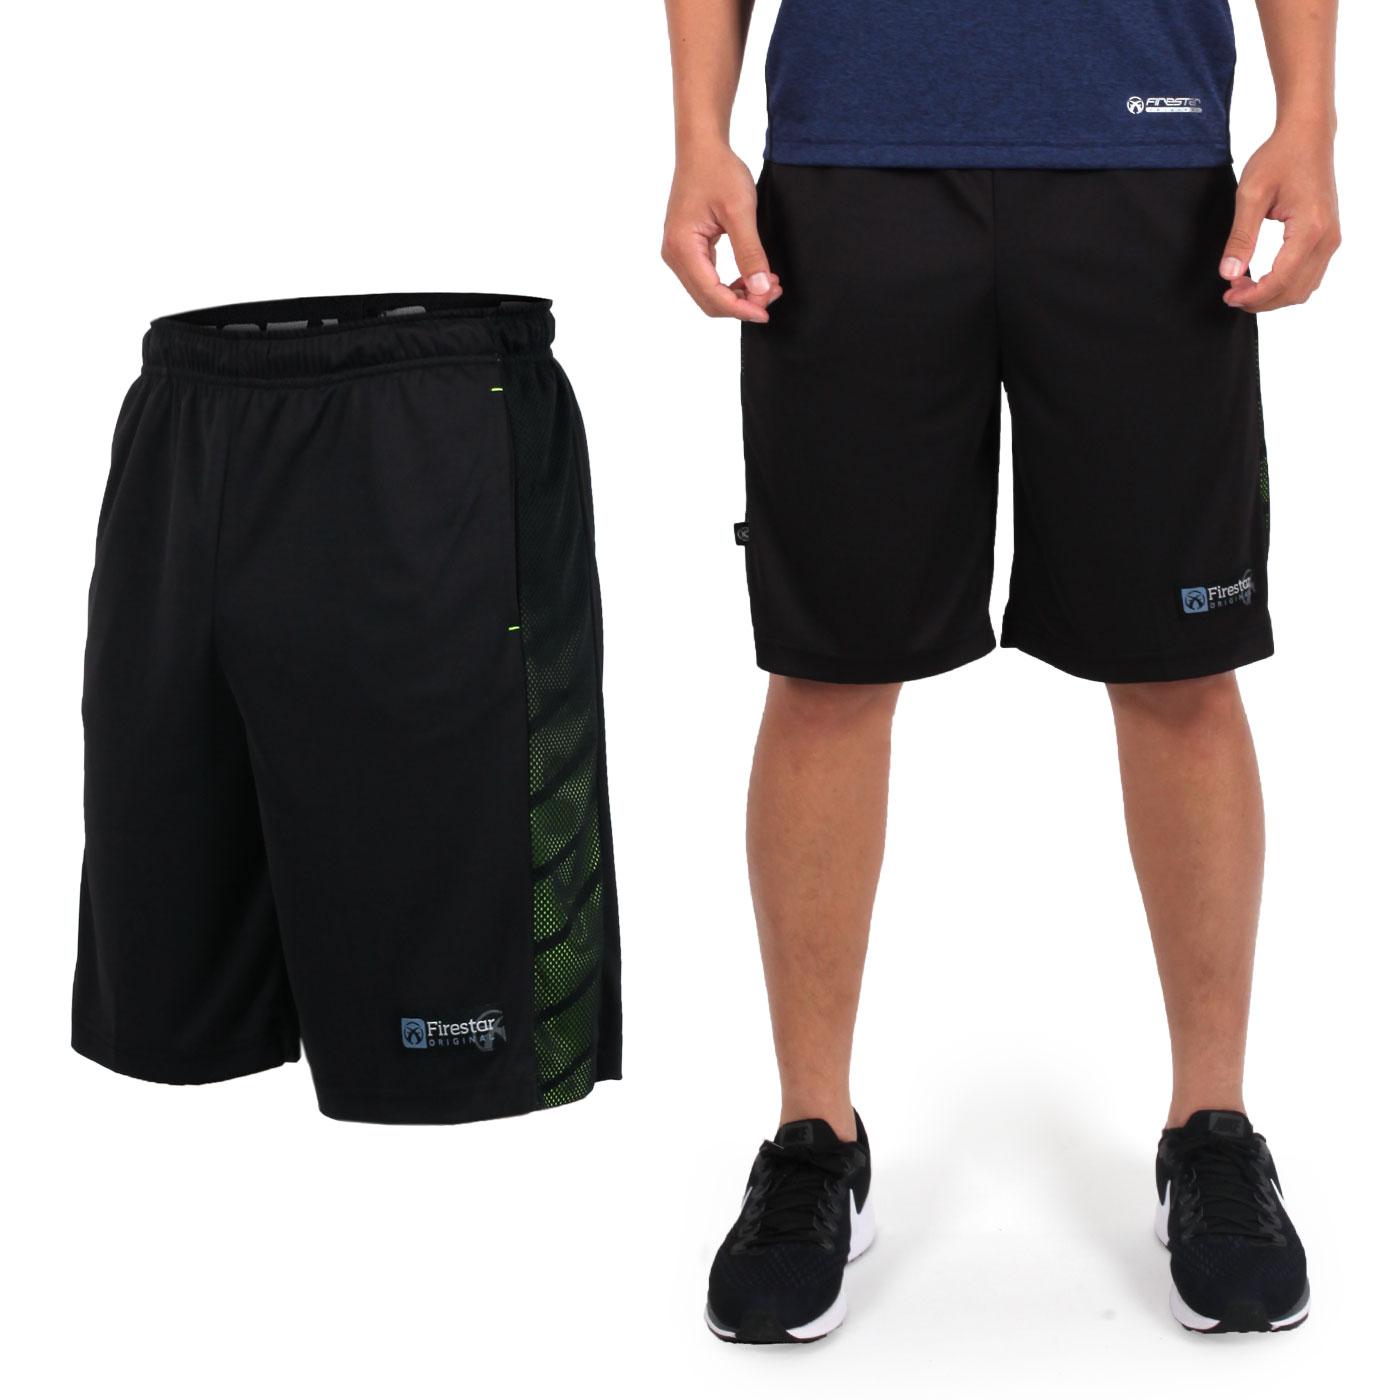 FIRESTAR 男款吸排籃球褲 B7601-10 - 黑螢光綠